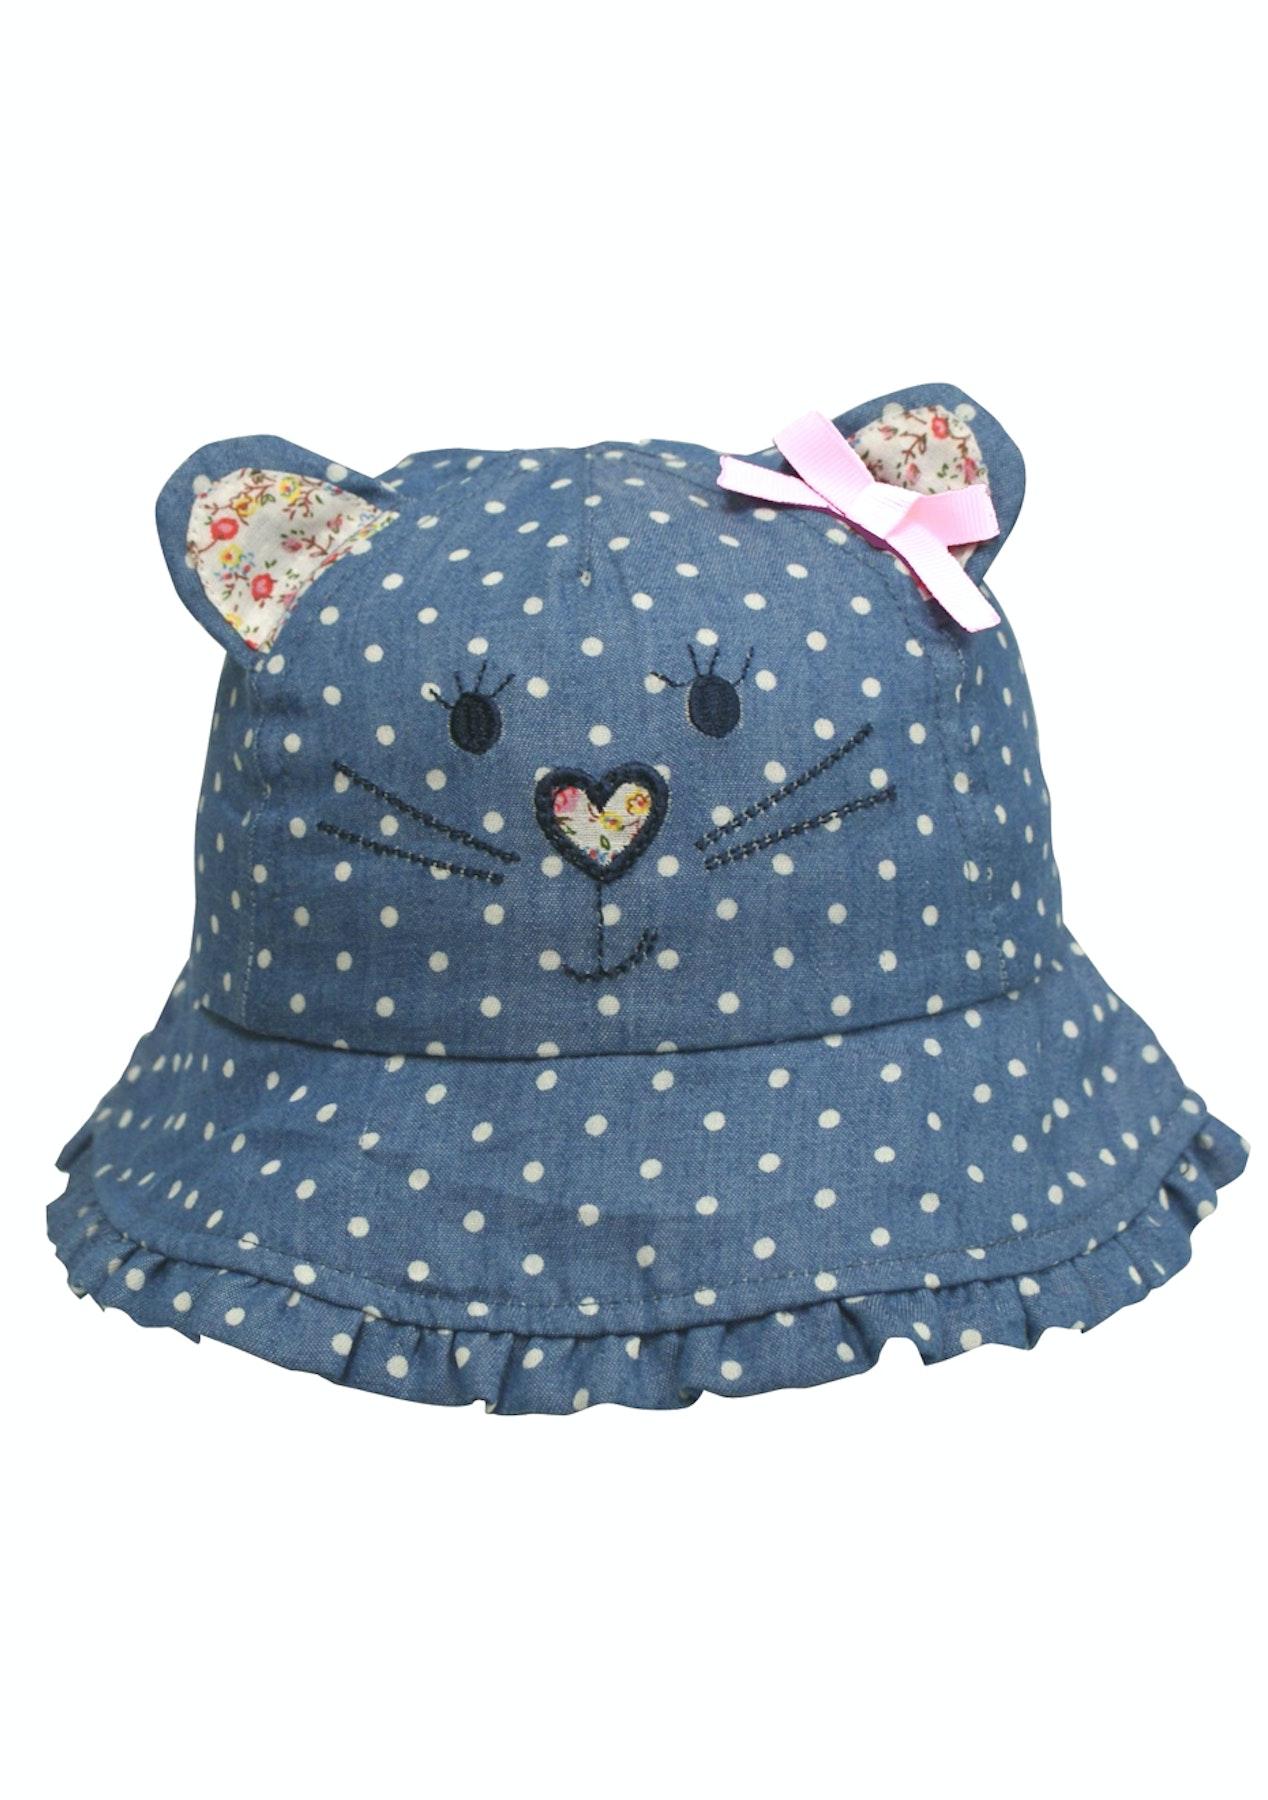 396ce023185 Hi-Hop Spotty Cat Girls Bucket Hat - Big Baby Sale - Onceit